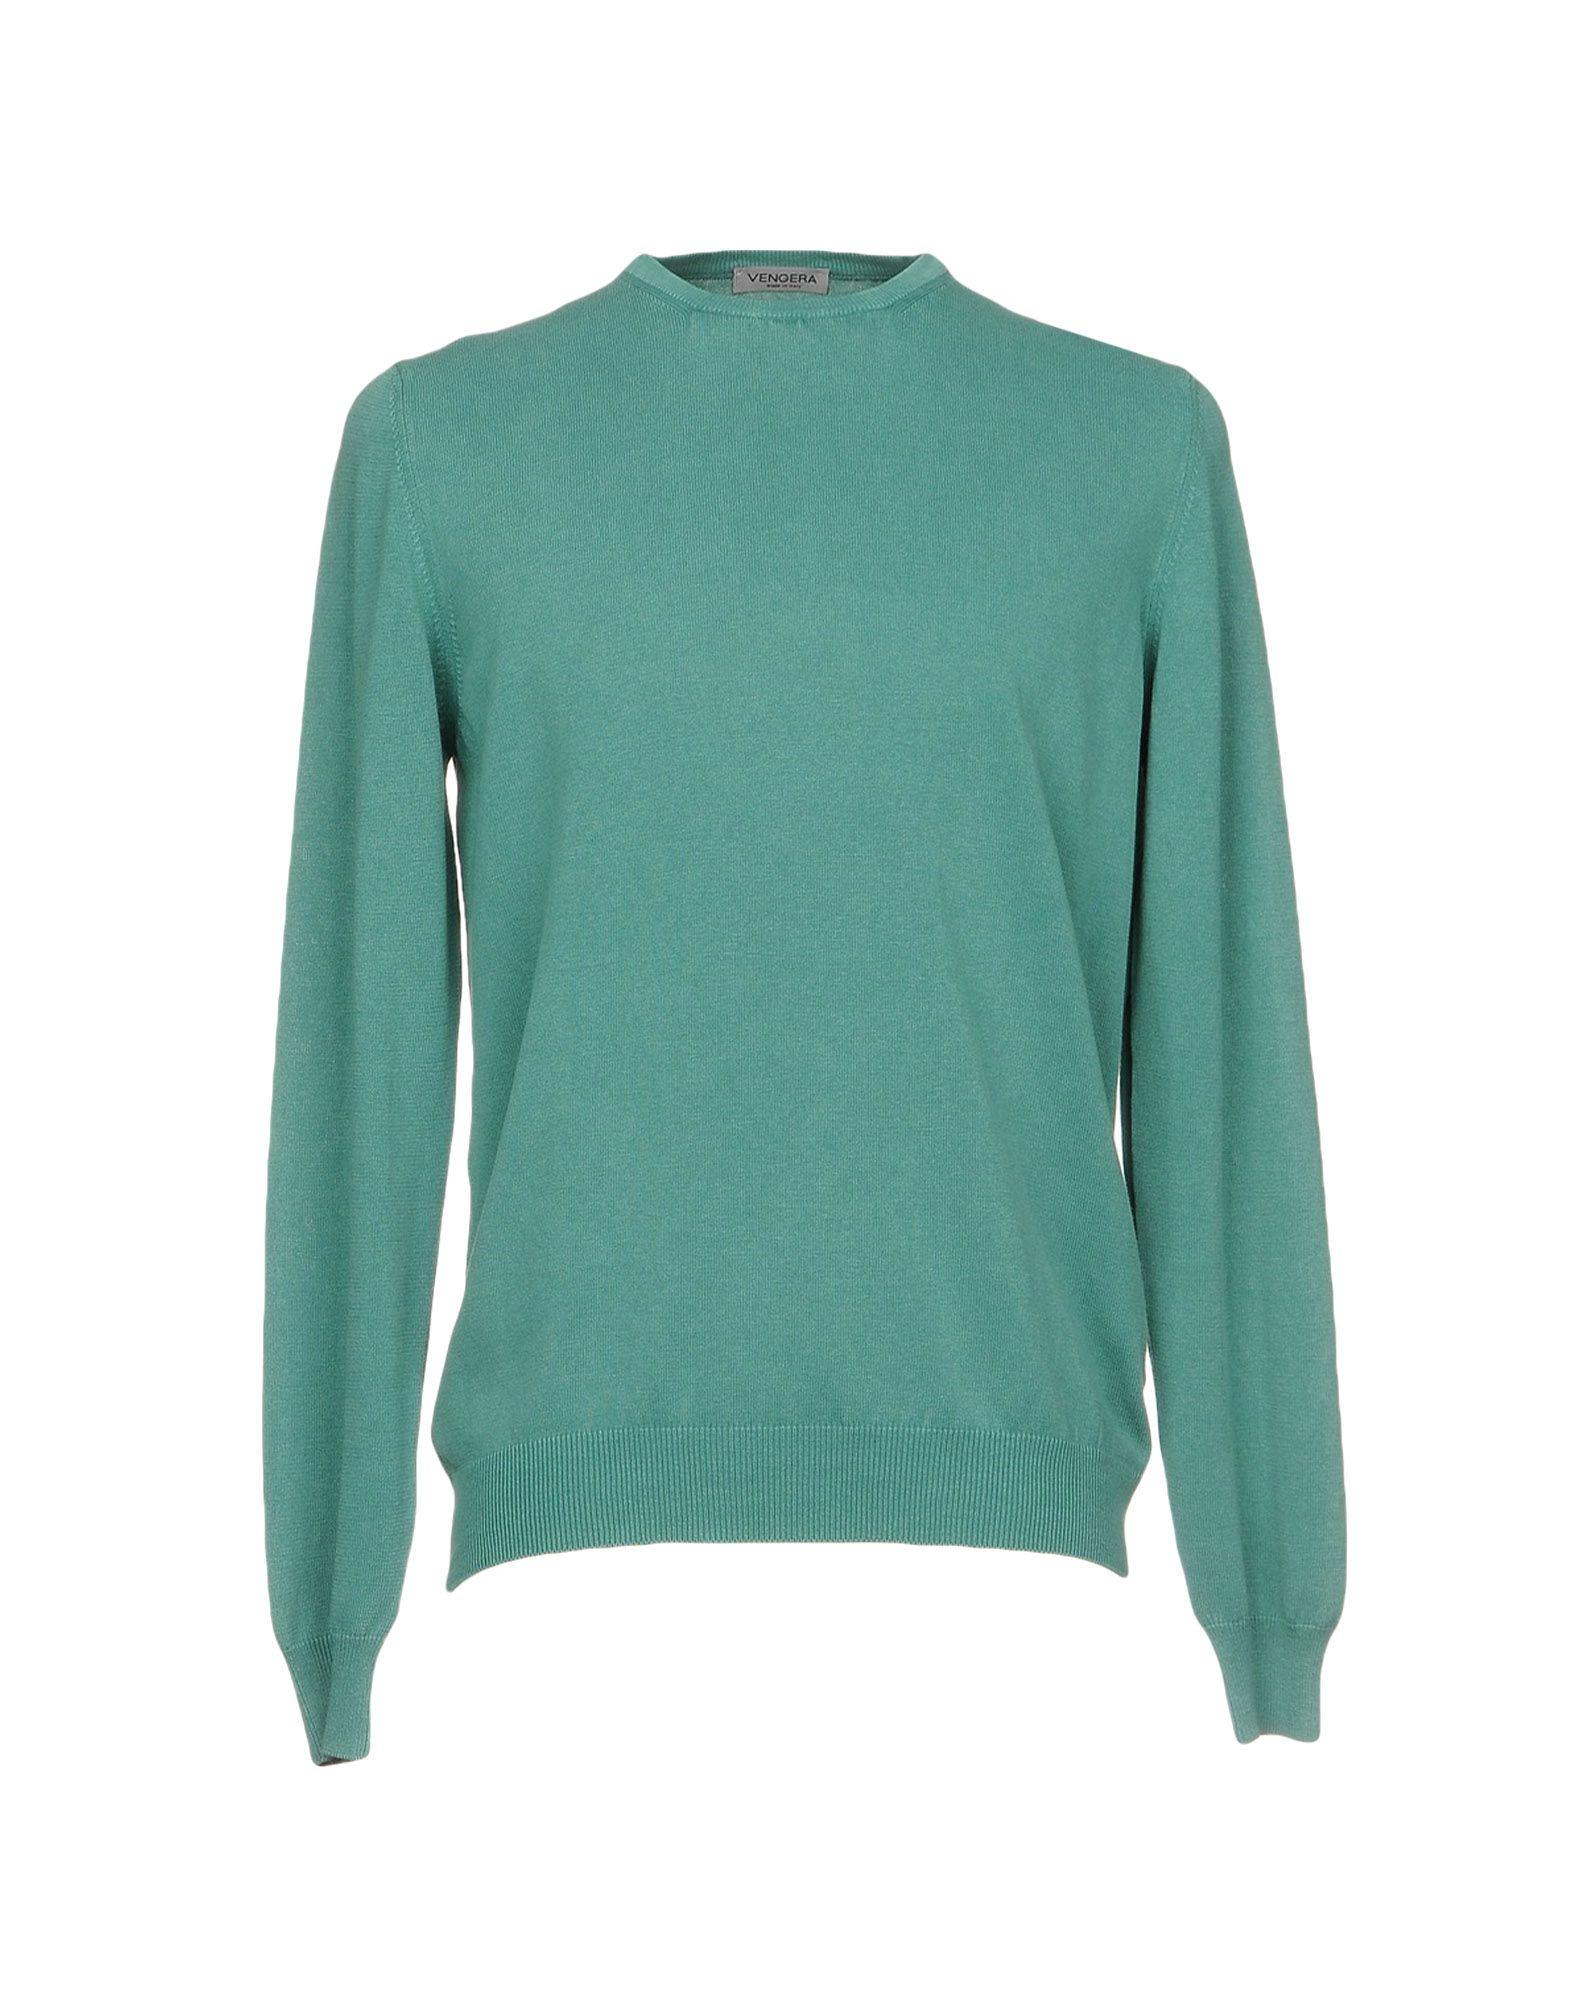 VENGERA Sweater in Green